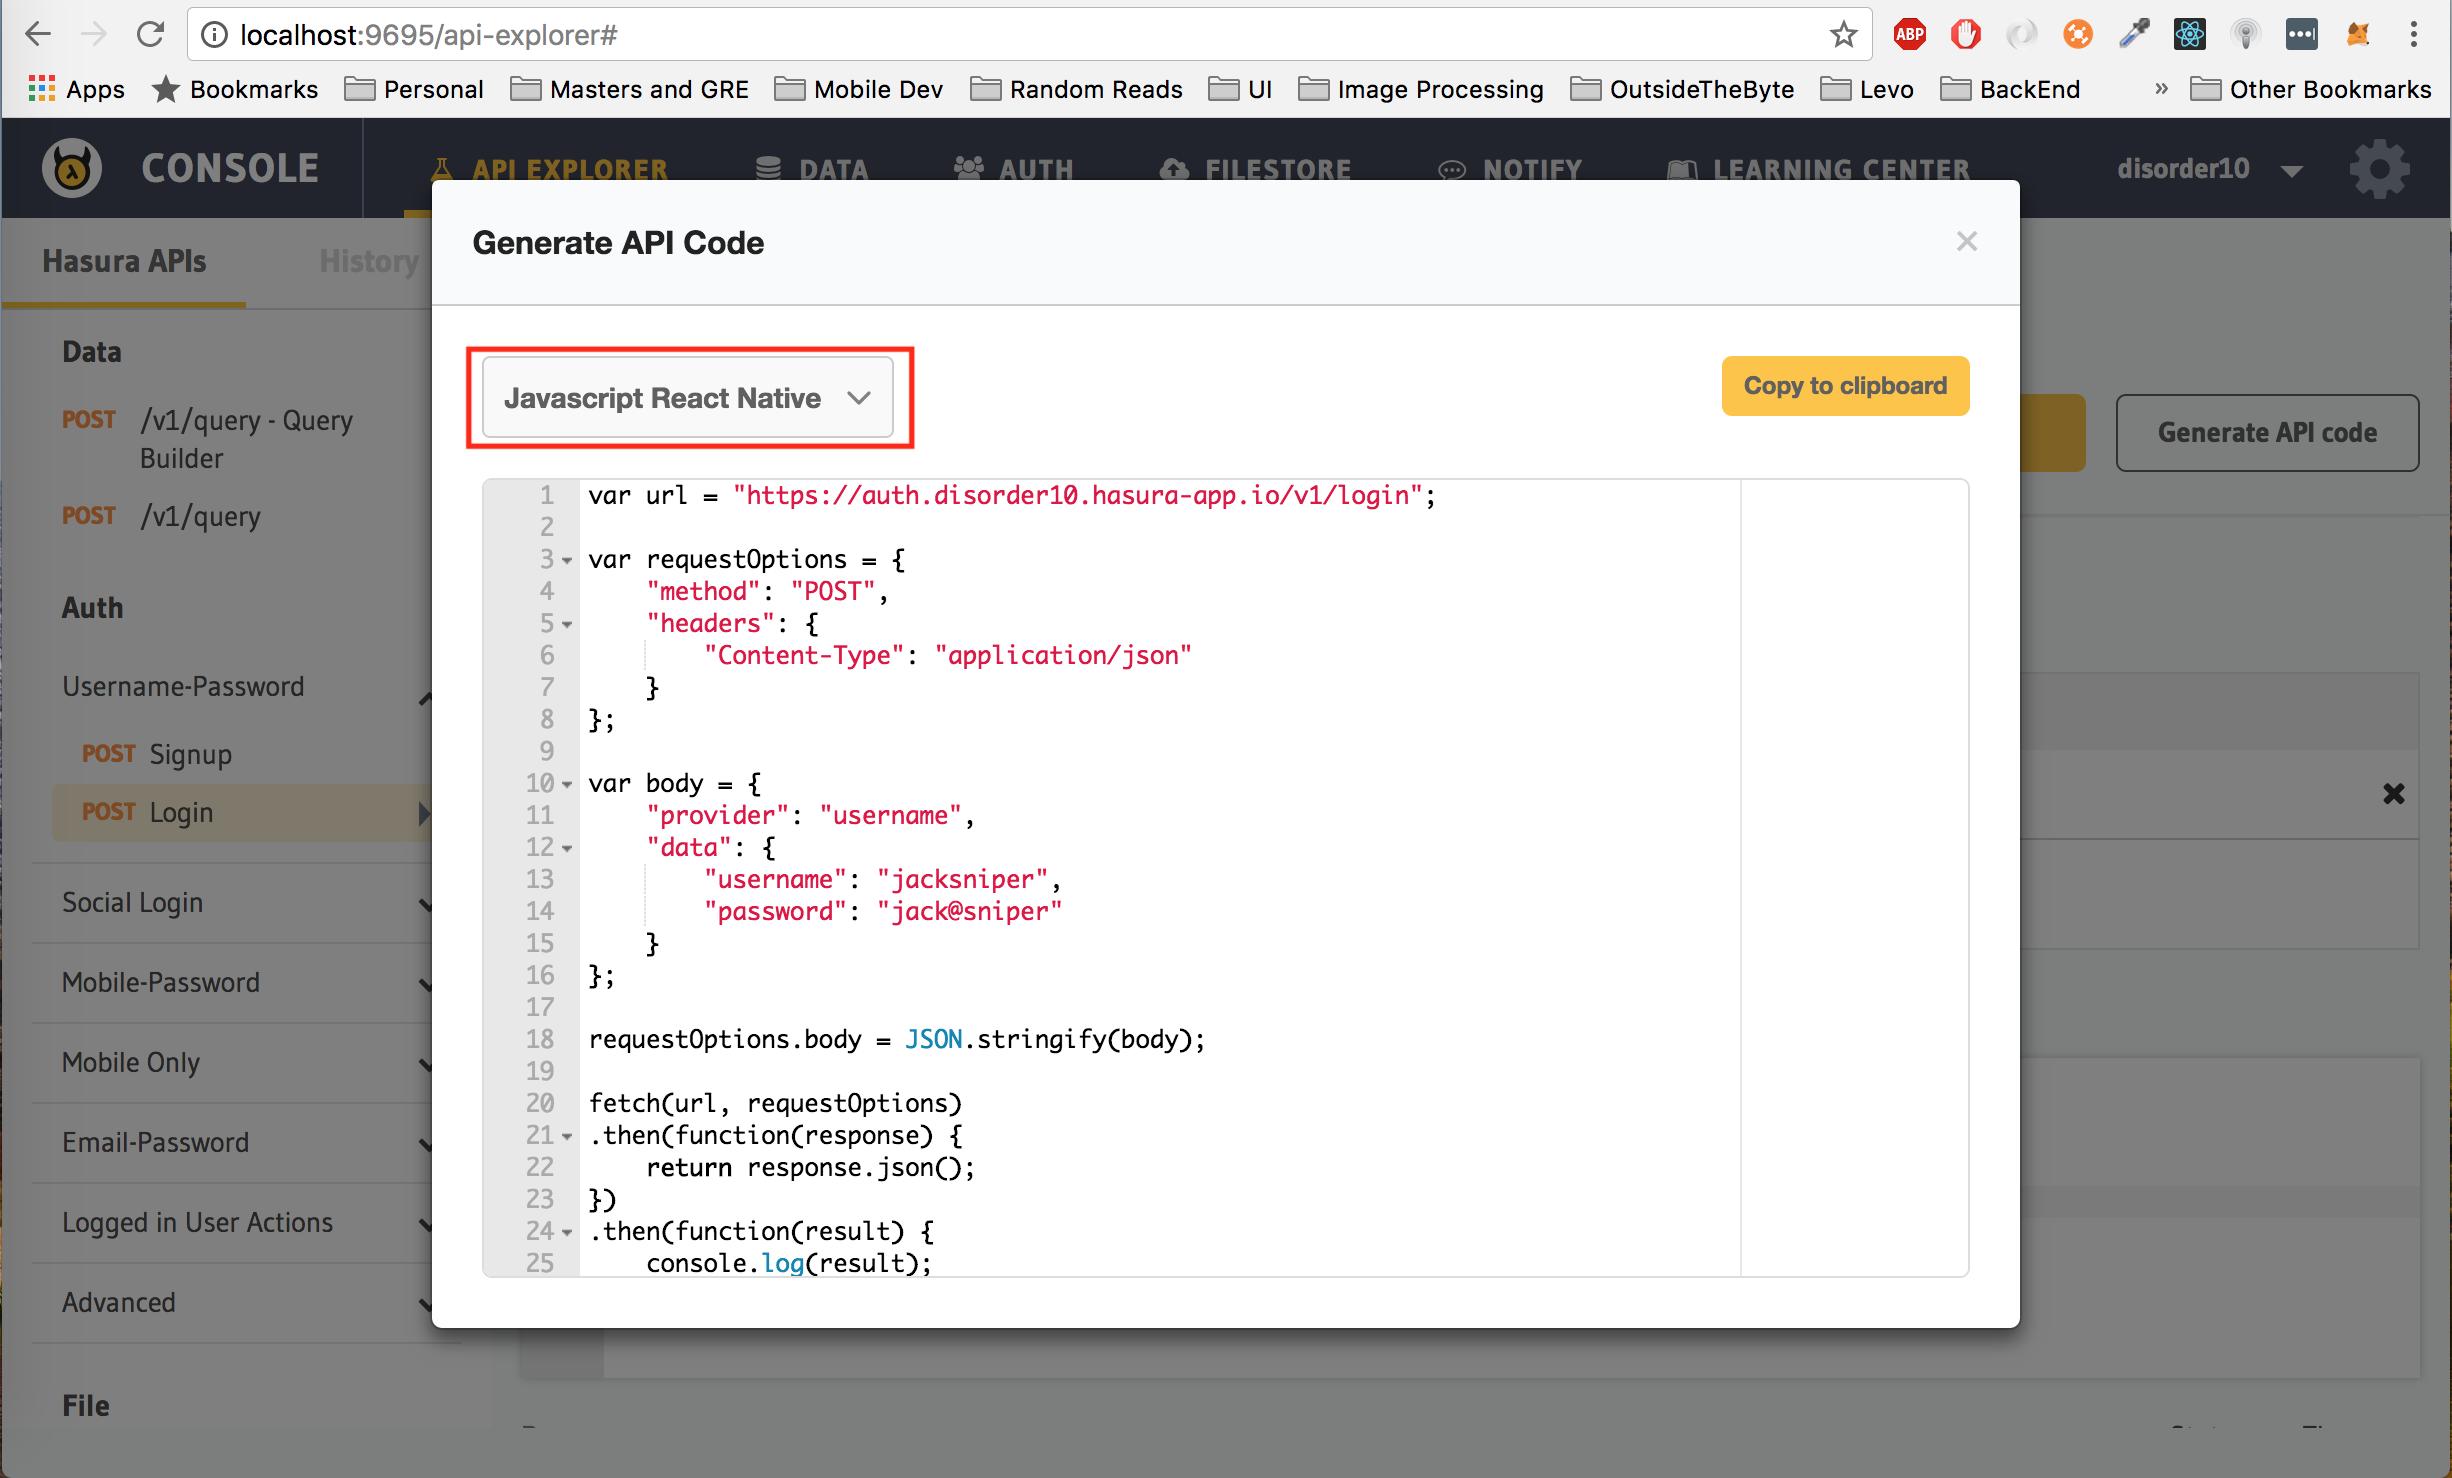 GitHub - k8s-platform-hub/hello-android: A tutorial to help